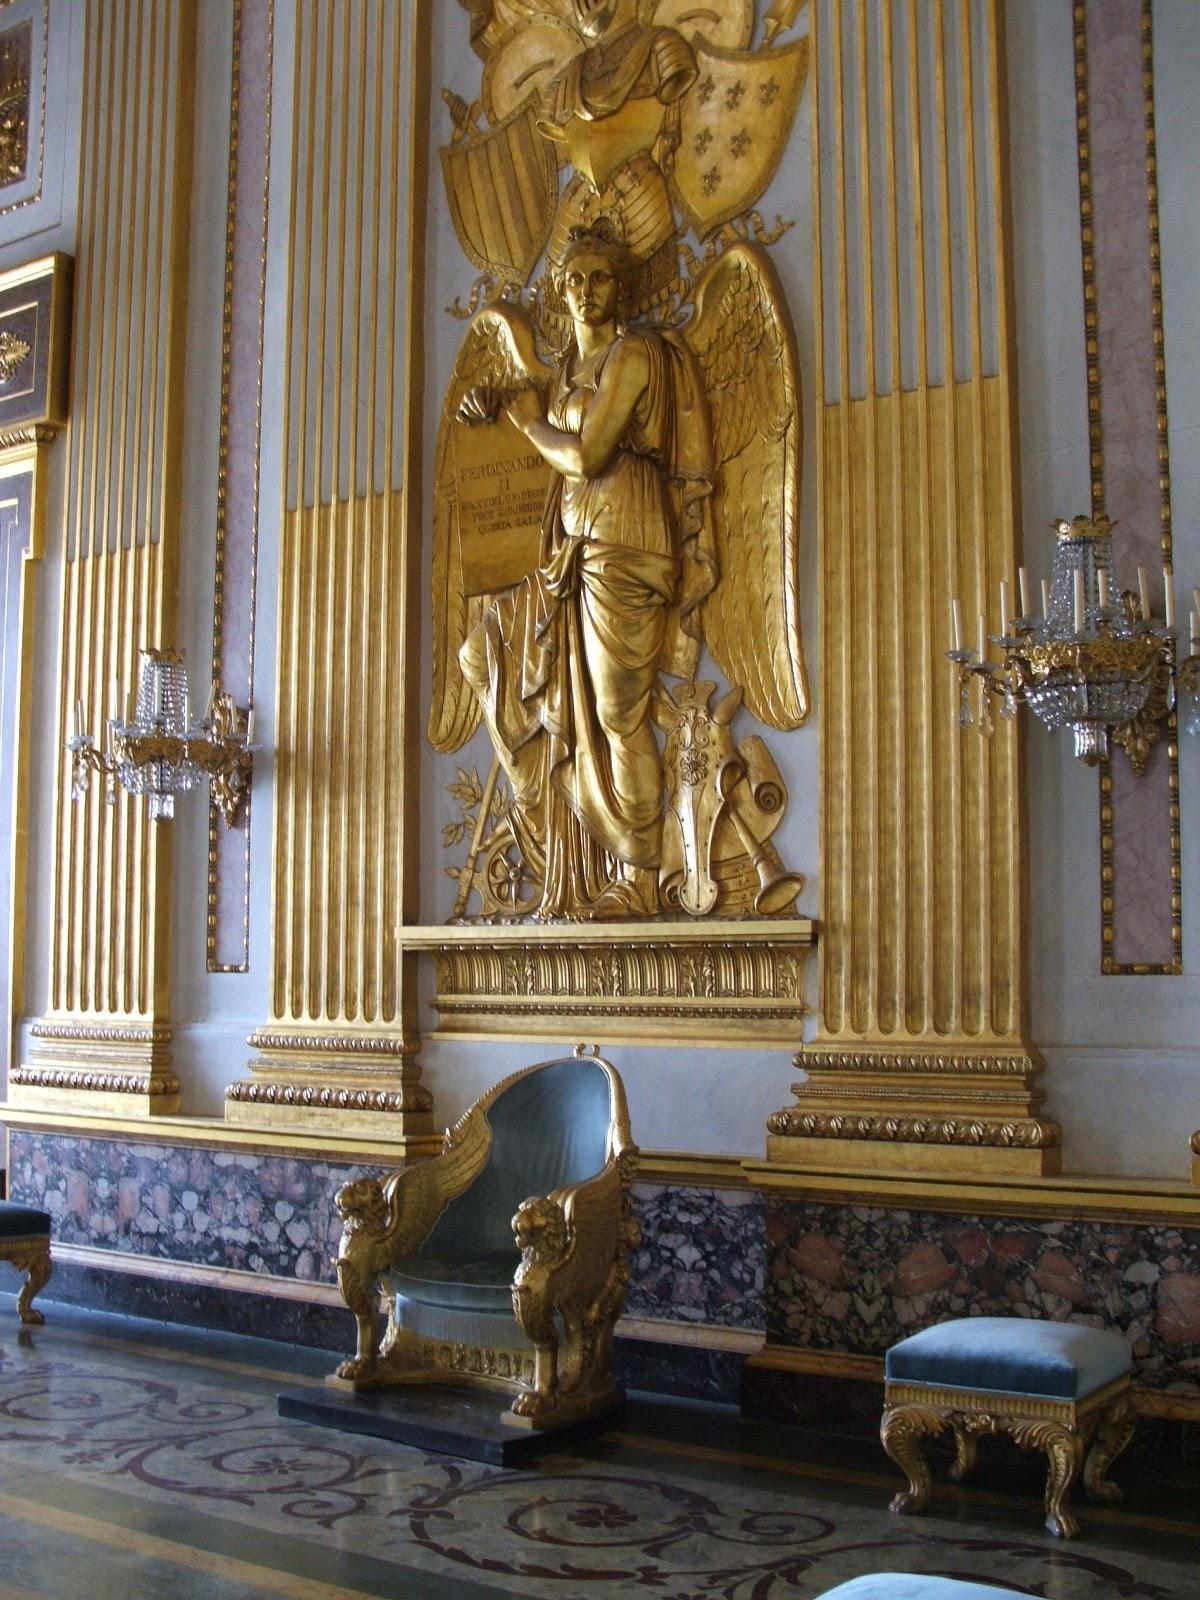 Devoluciones gratuitas (obra de 1148271) Royal Palace Of Caserta A Triumph Of Italian Baroque Tutt Art Pittura Scultura Poesia Musica